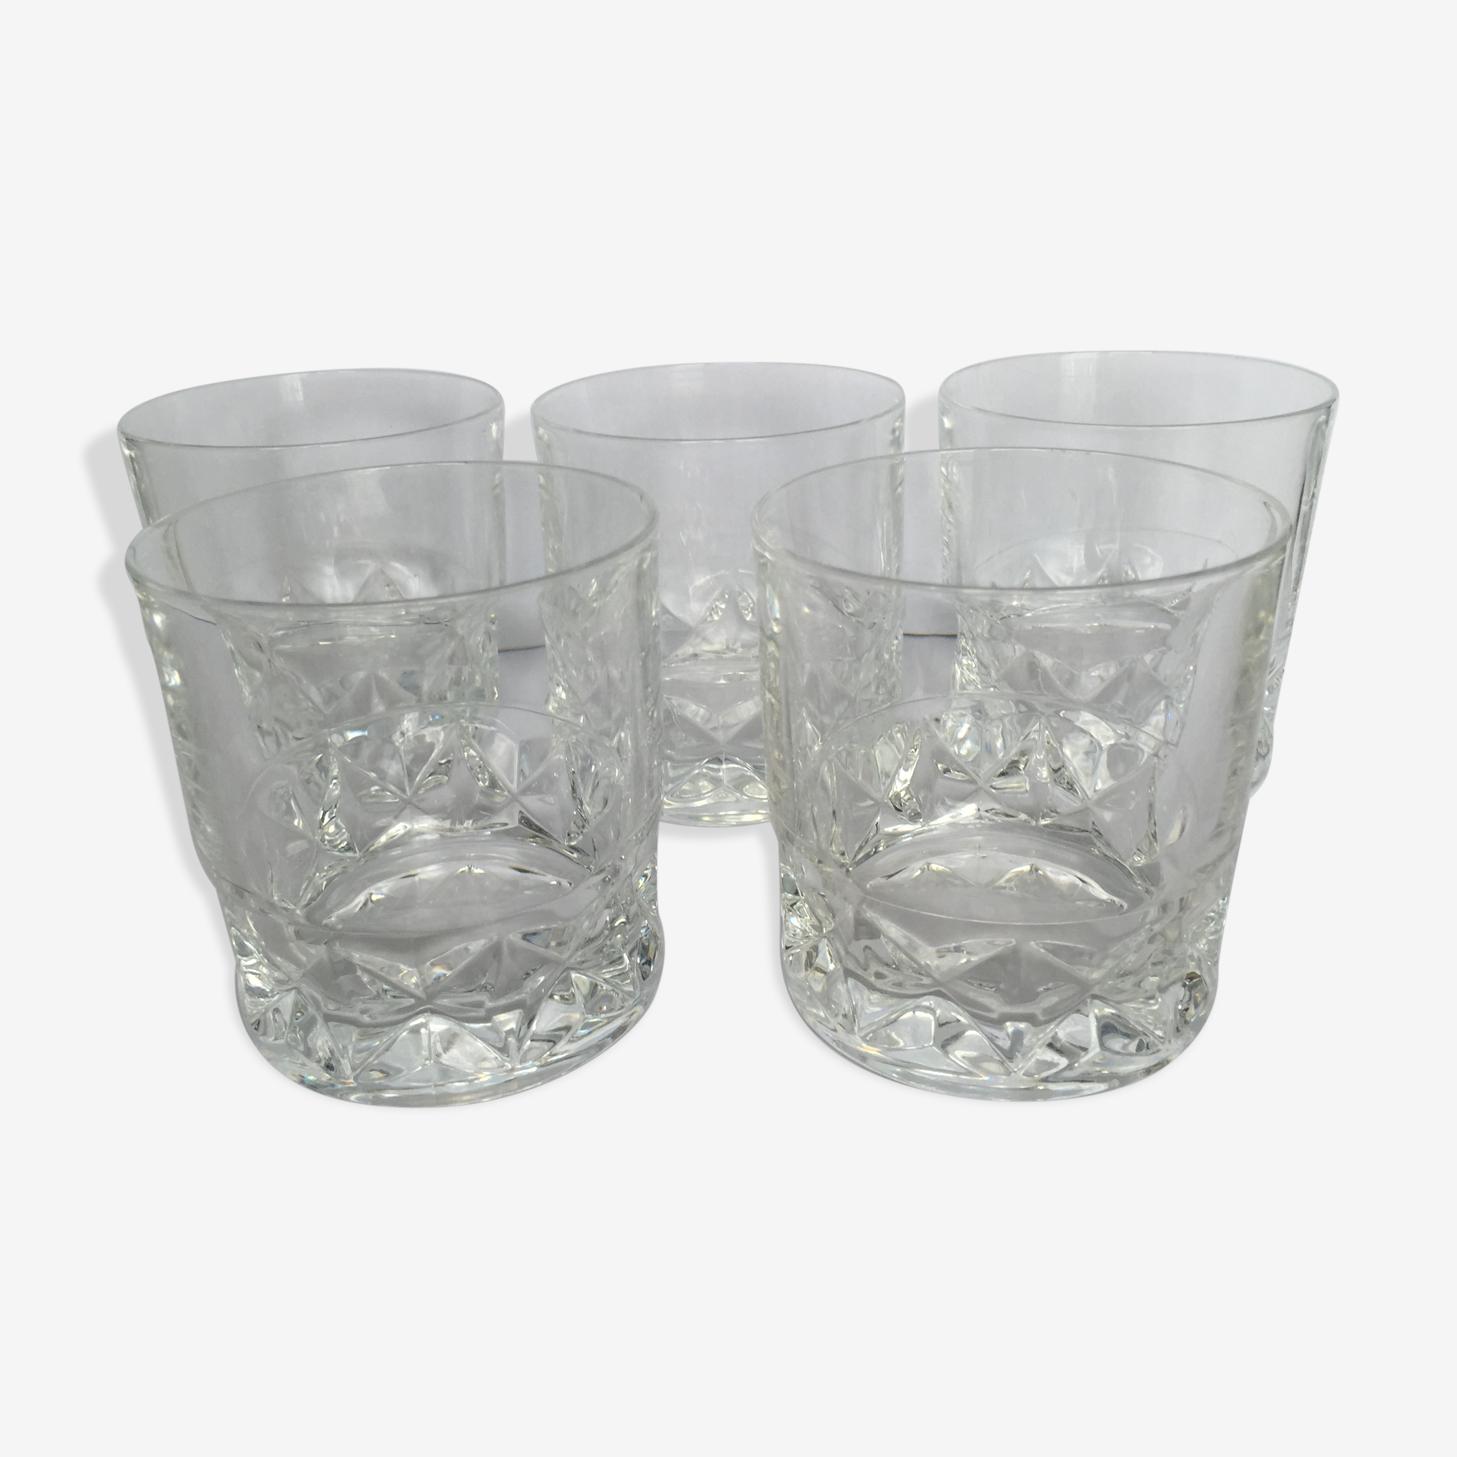 5 verres à whisky en cristal